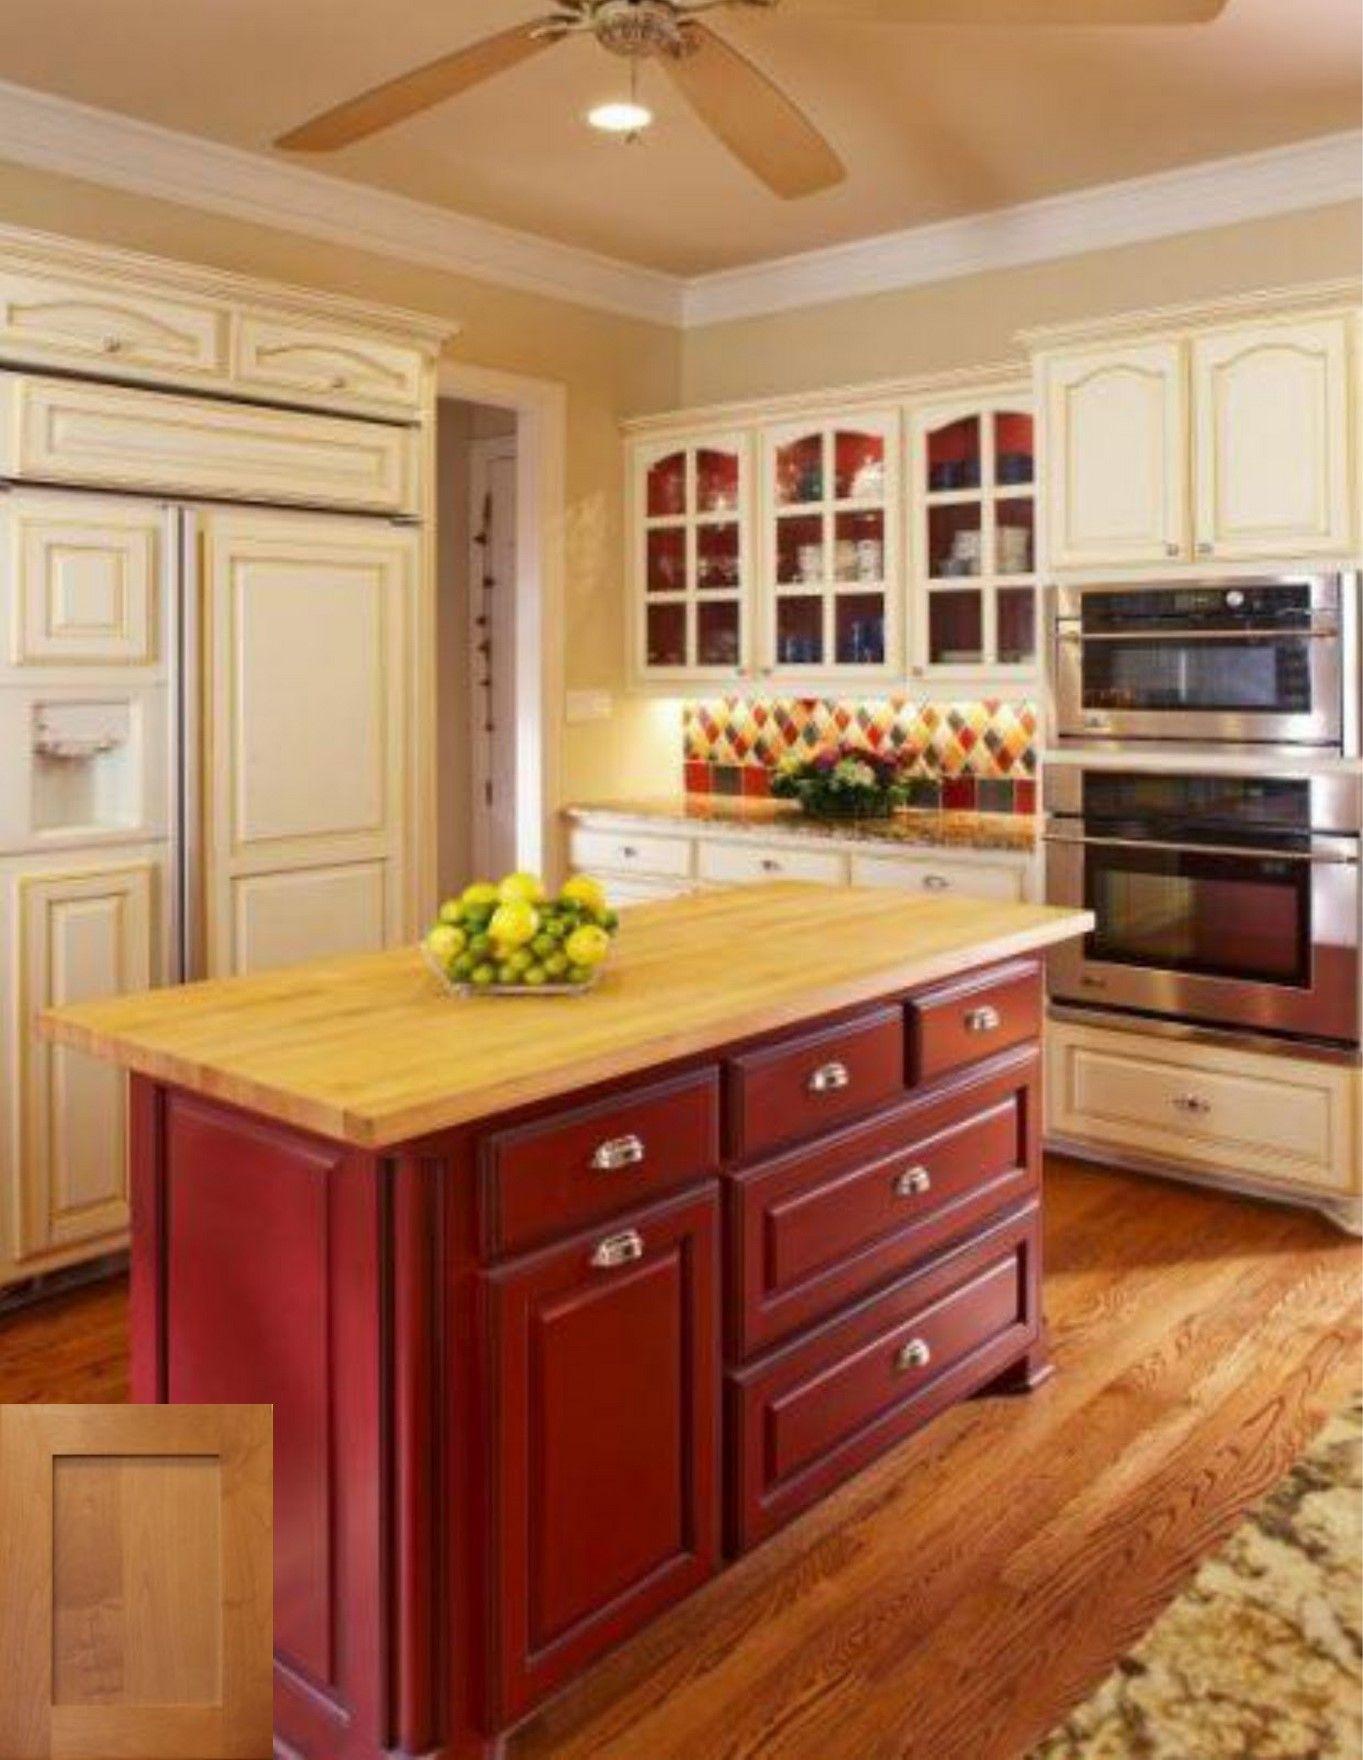 Pin By Melissa Rist On Farmhouse Red Kitchen Cabinets Barn Red Kitchen Kitchen Backsplash Designs